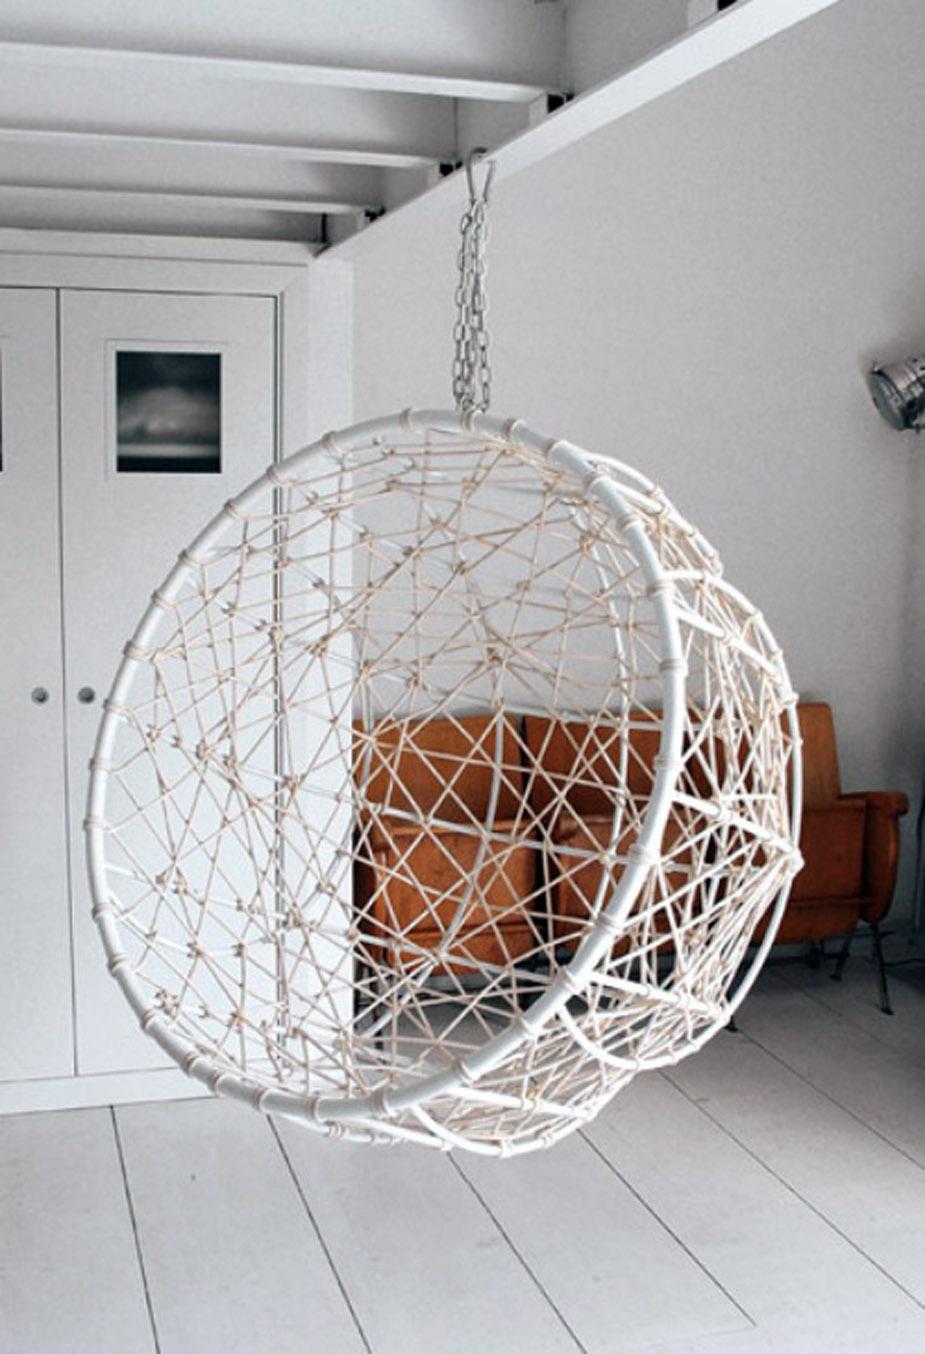 Hanging Chairs Viskas Apie Interjera